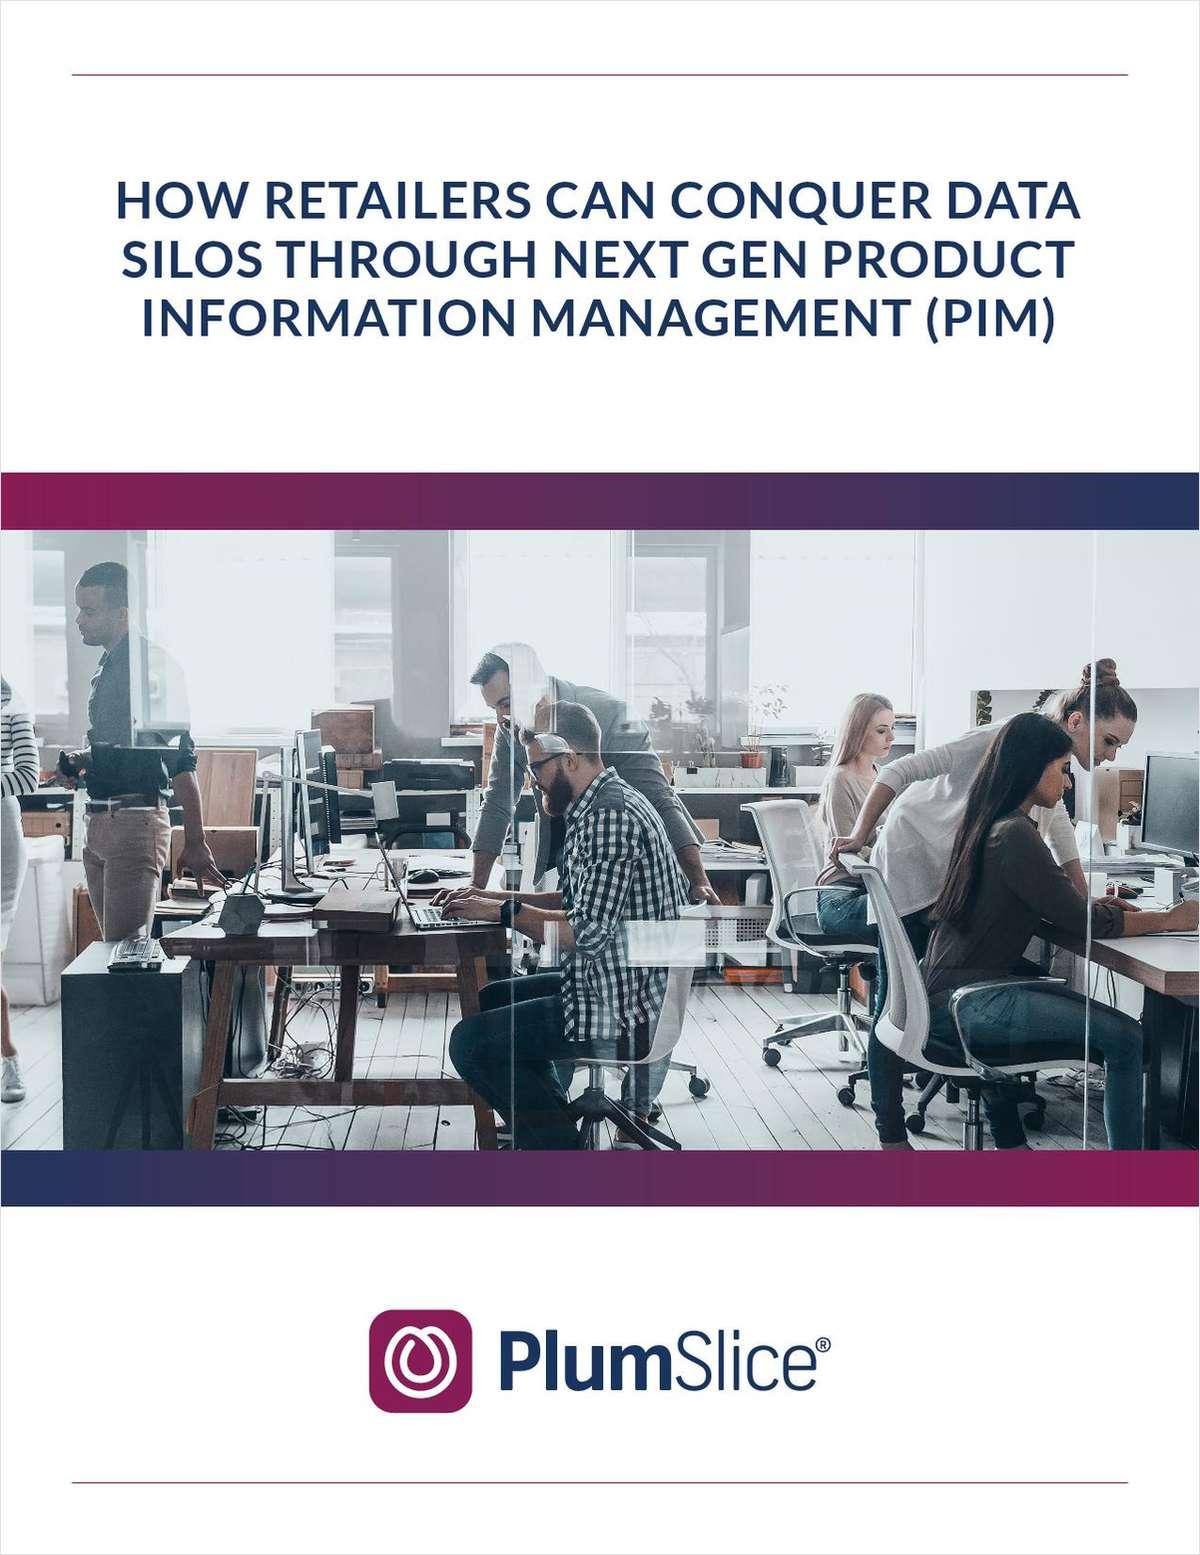 How Retailers Can Conquer Data Silos Through Next Gen Product Information Management (PIM)